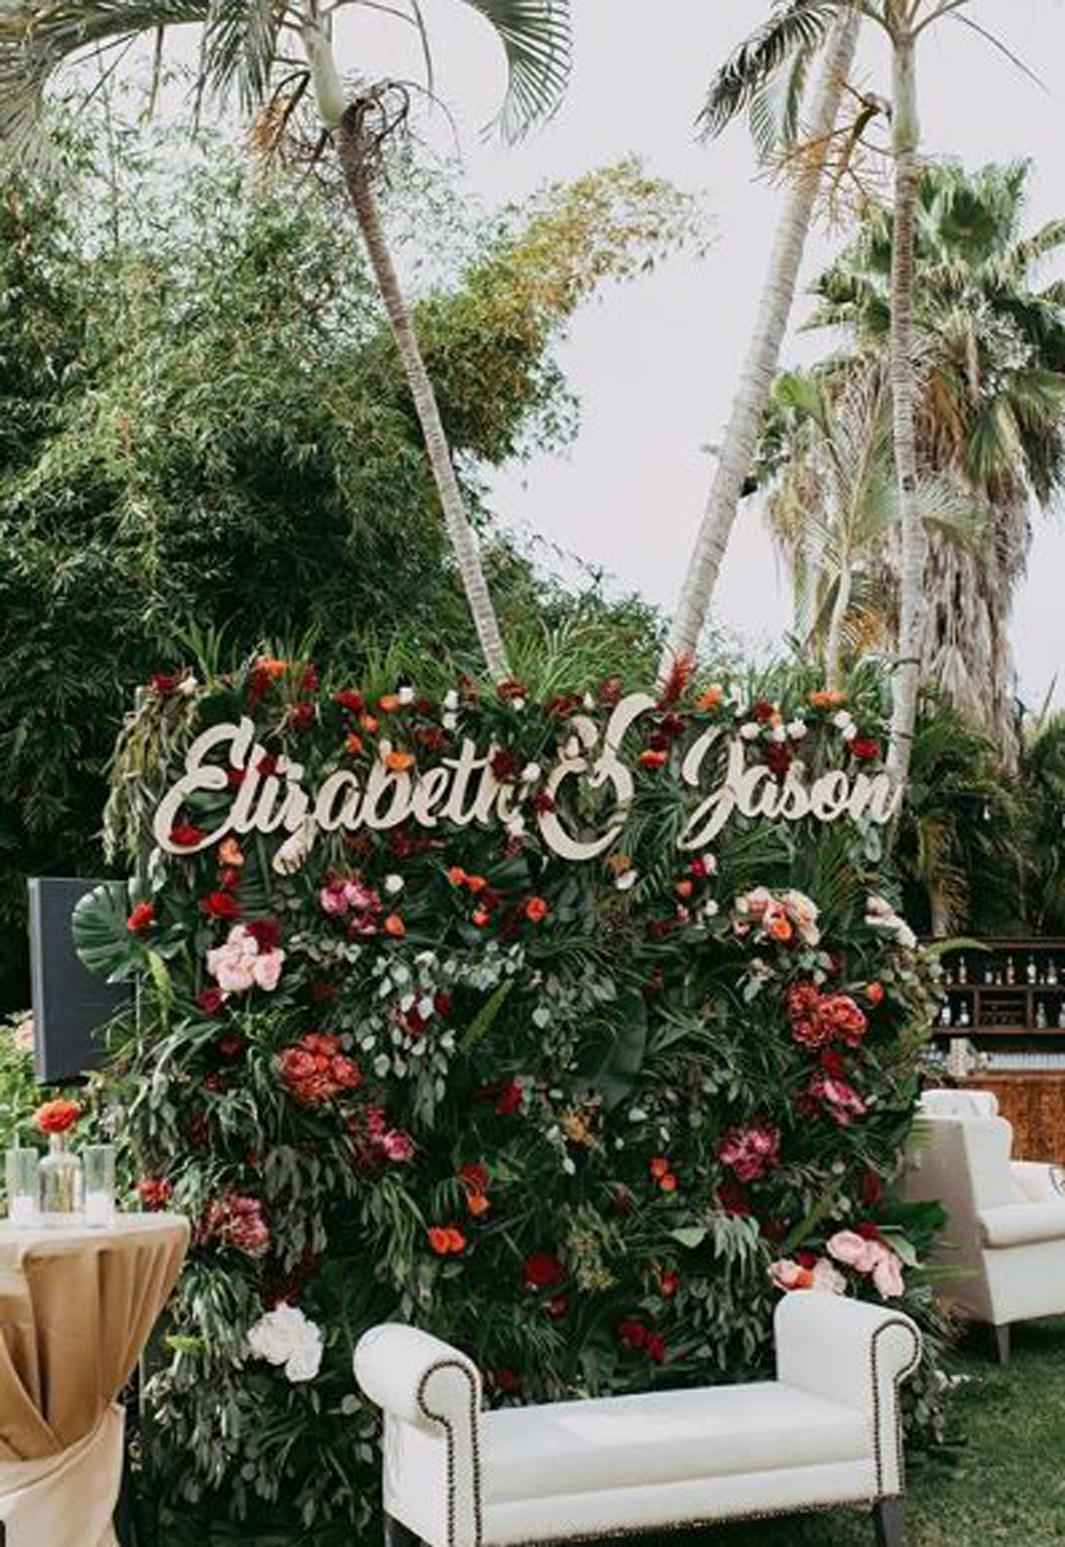 17 Fun & Unusual Wedding Photo Booth Ideas